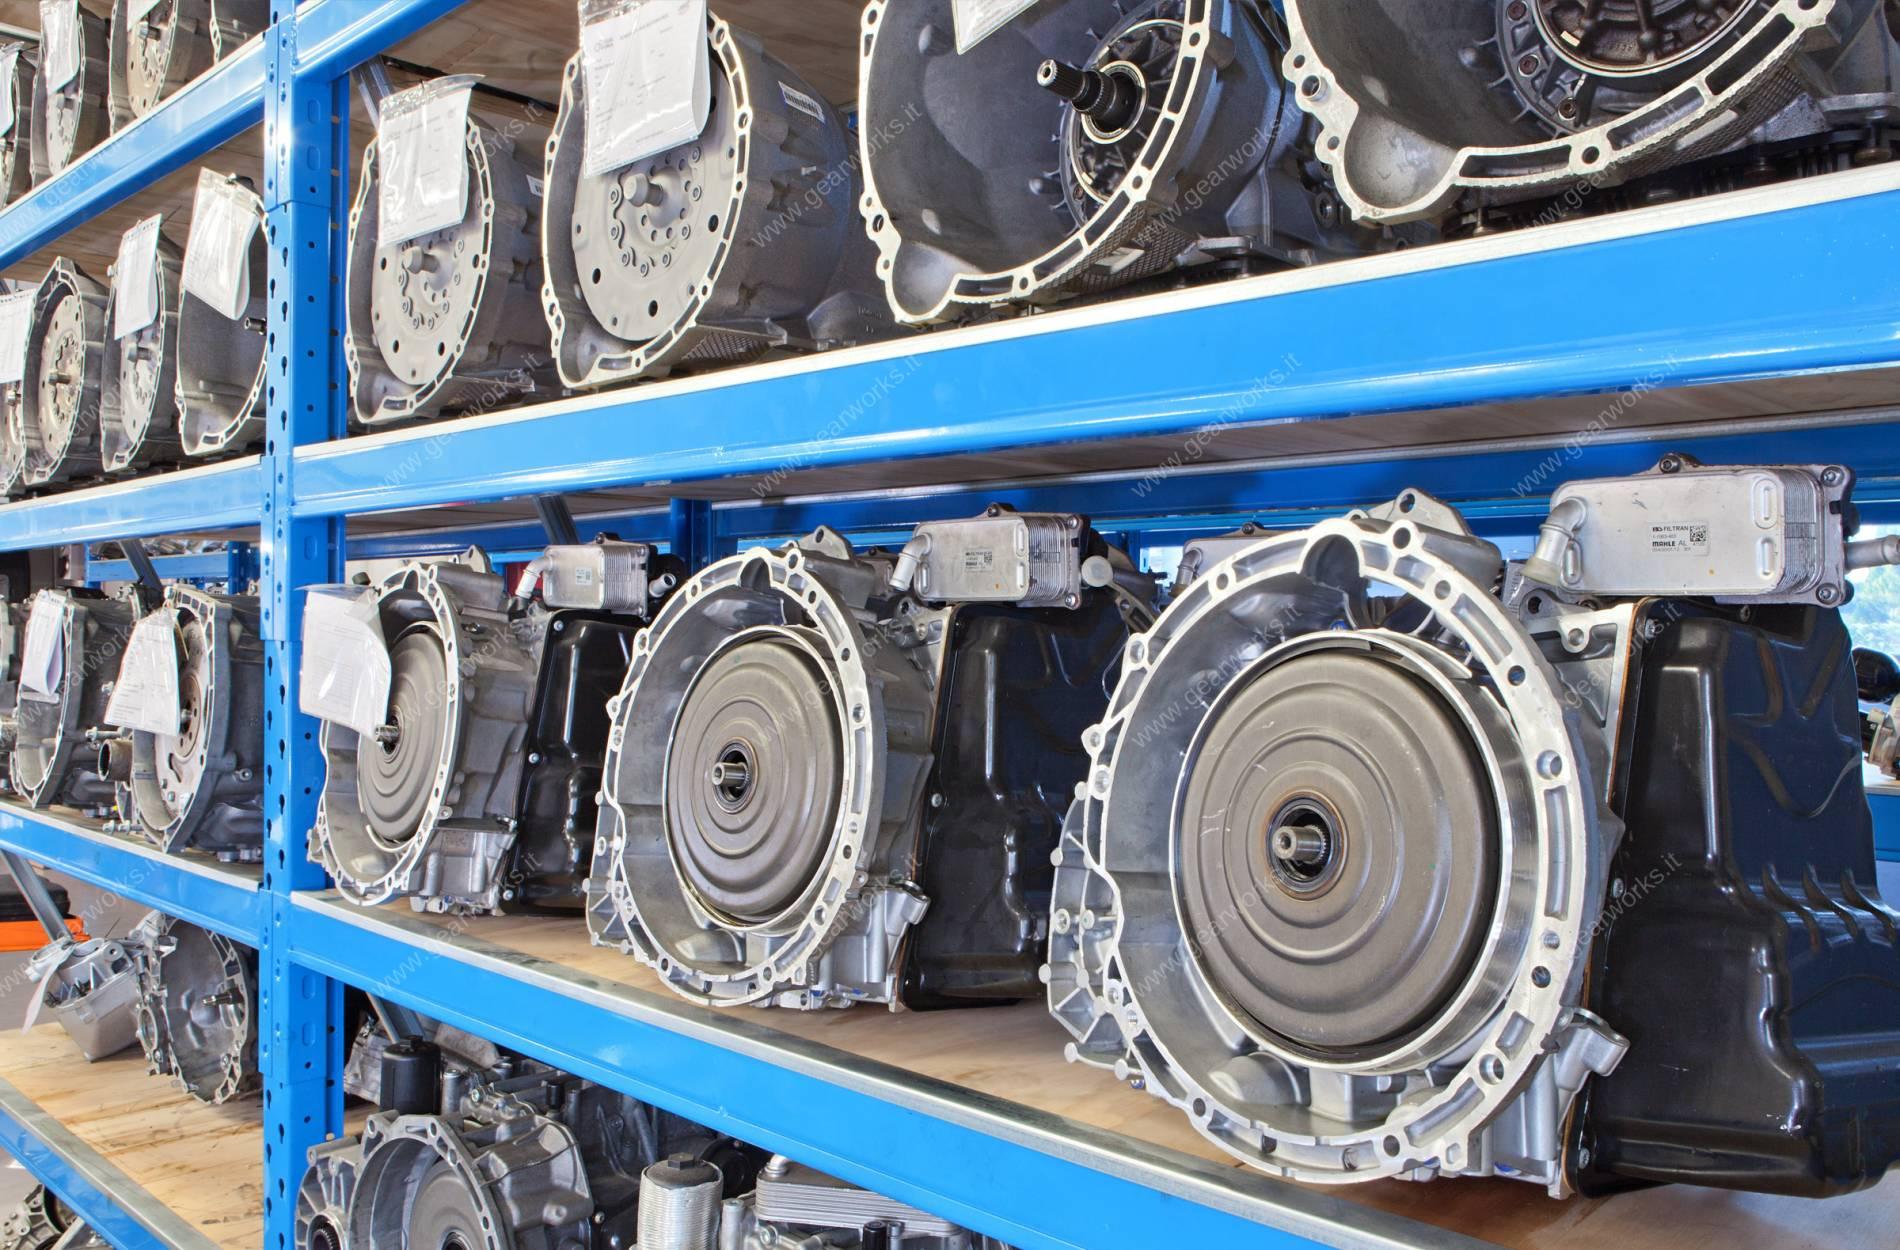 Genarworks magazzino cambi automatici e manuali